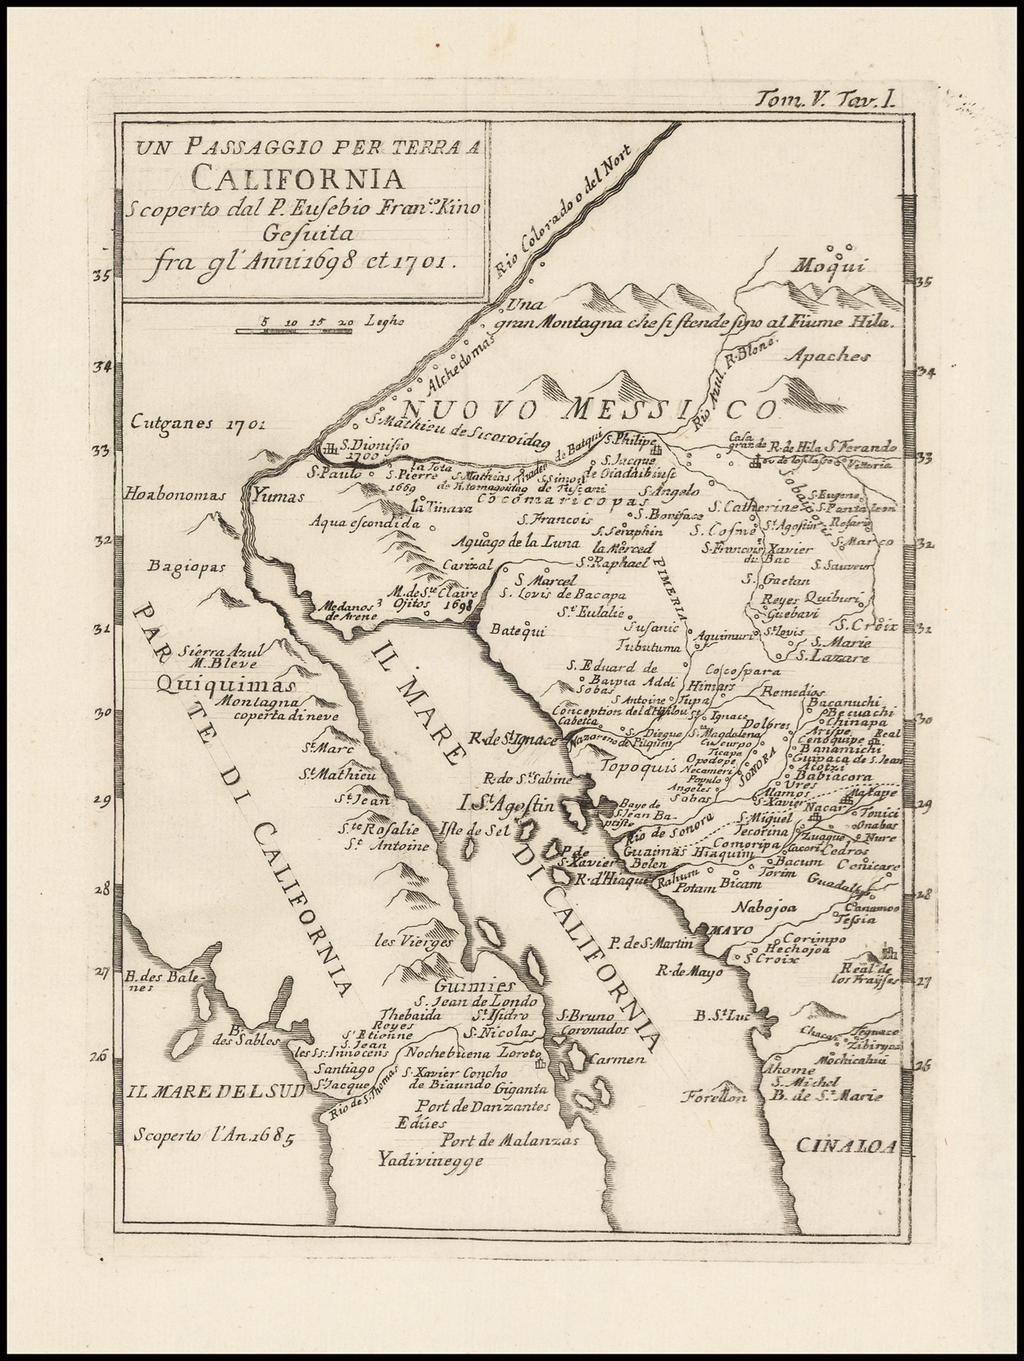 Un Passaggio per Terra a California Scoperto dal P. Eusebio Francesco Kino Gesuita Fragli Anni 1698 et 1701 By Fr. Eusebio Kino